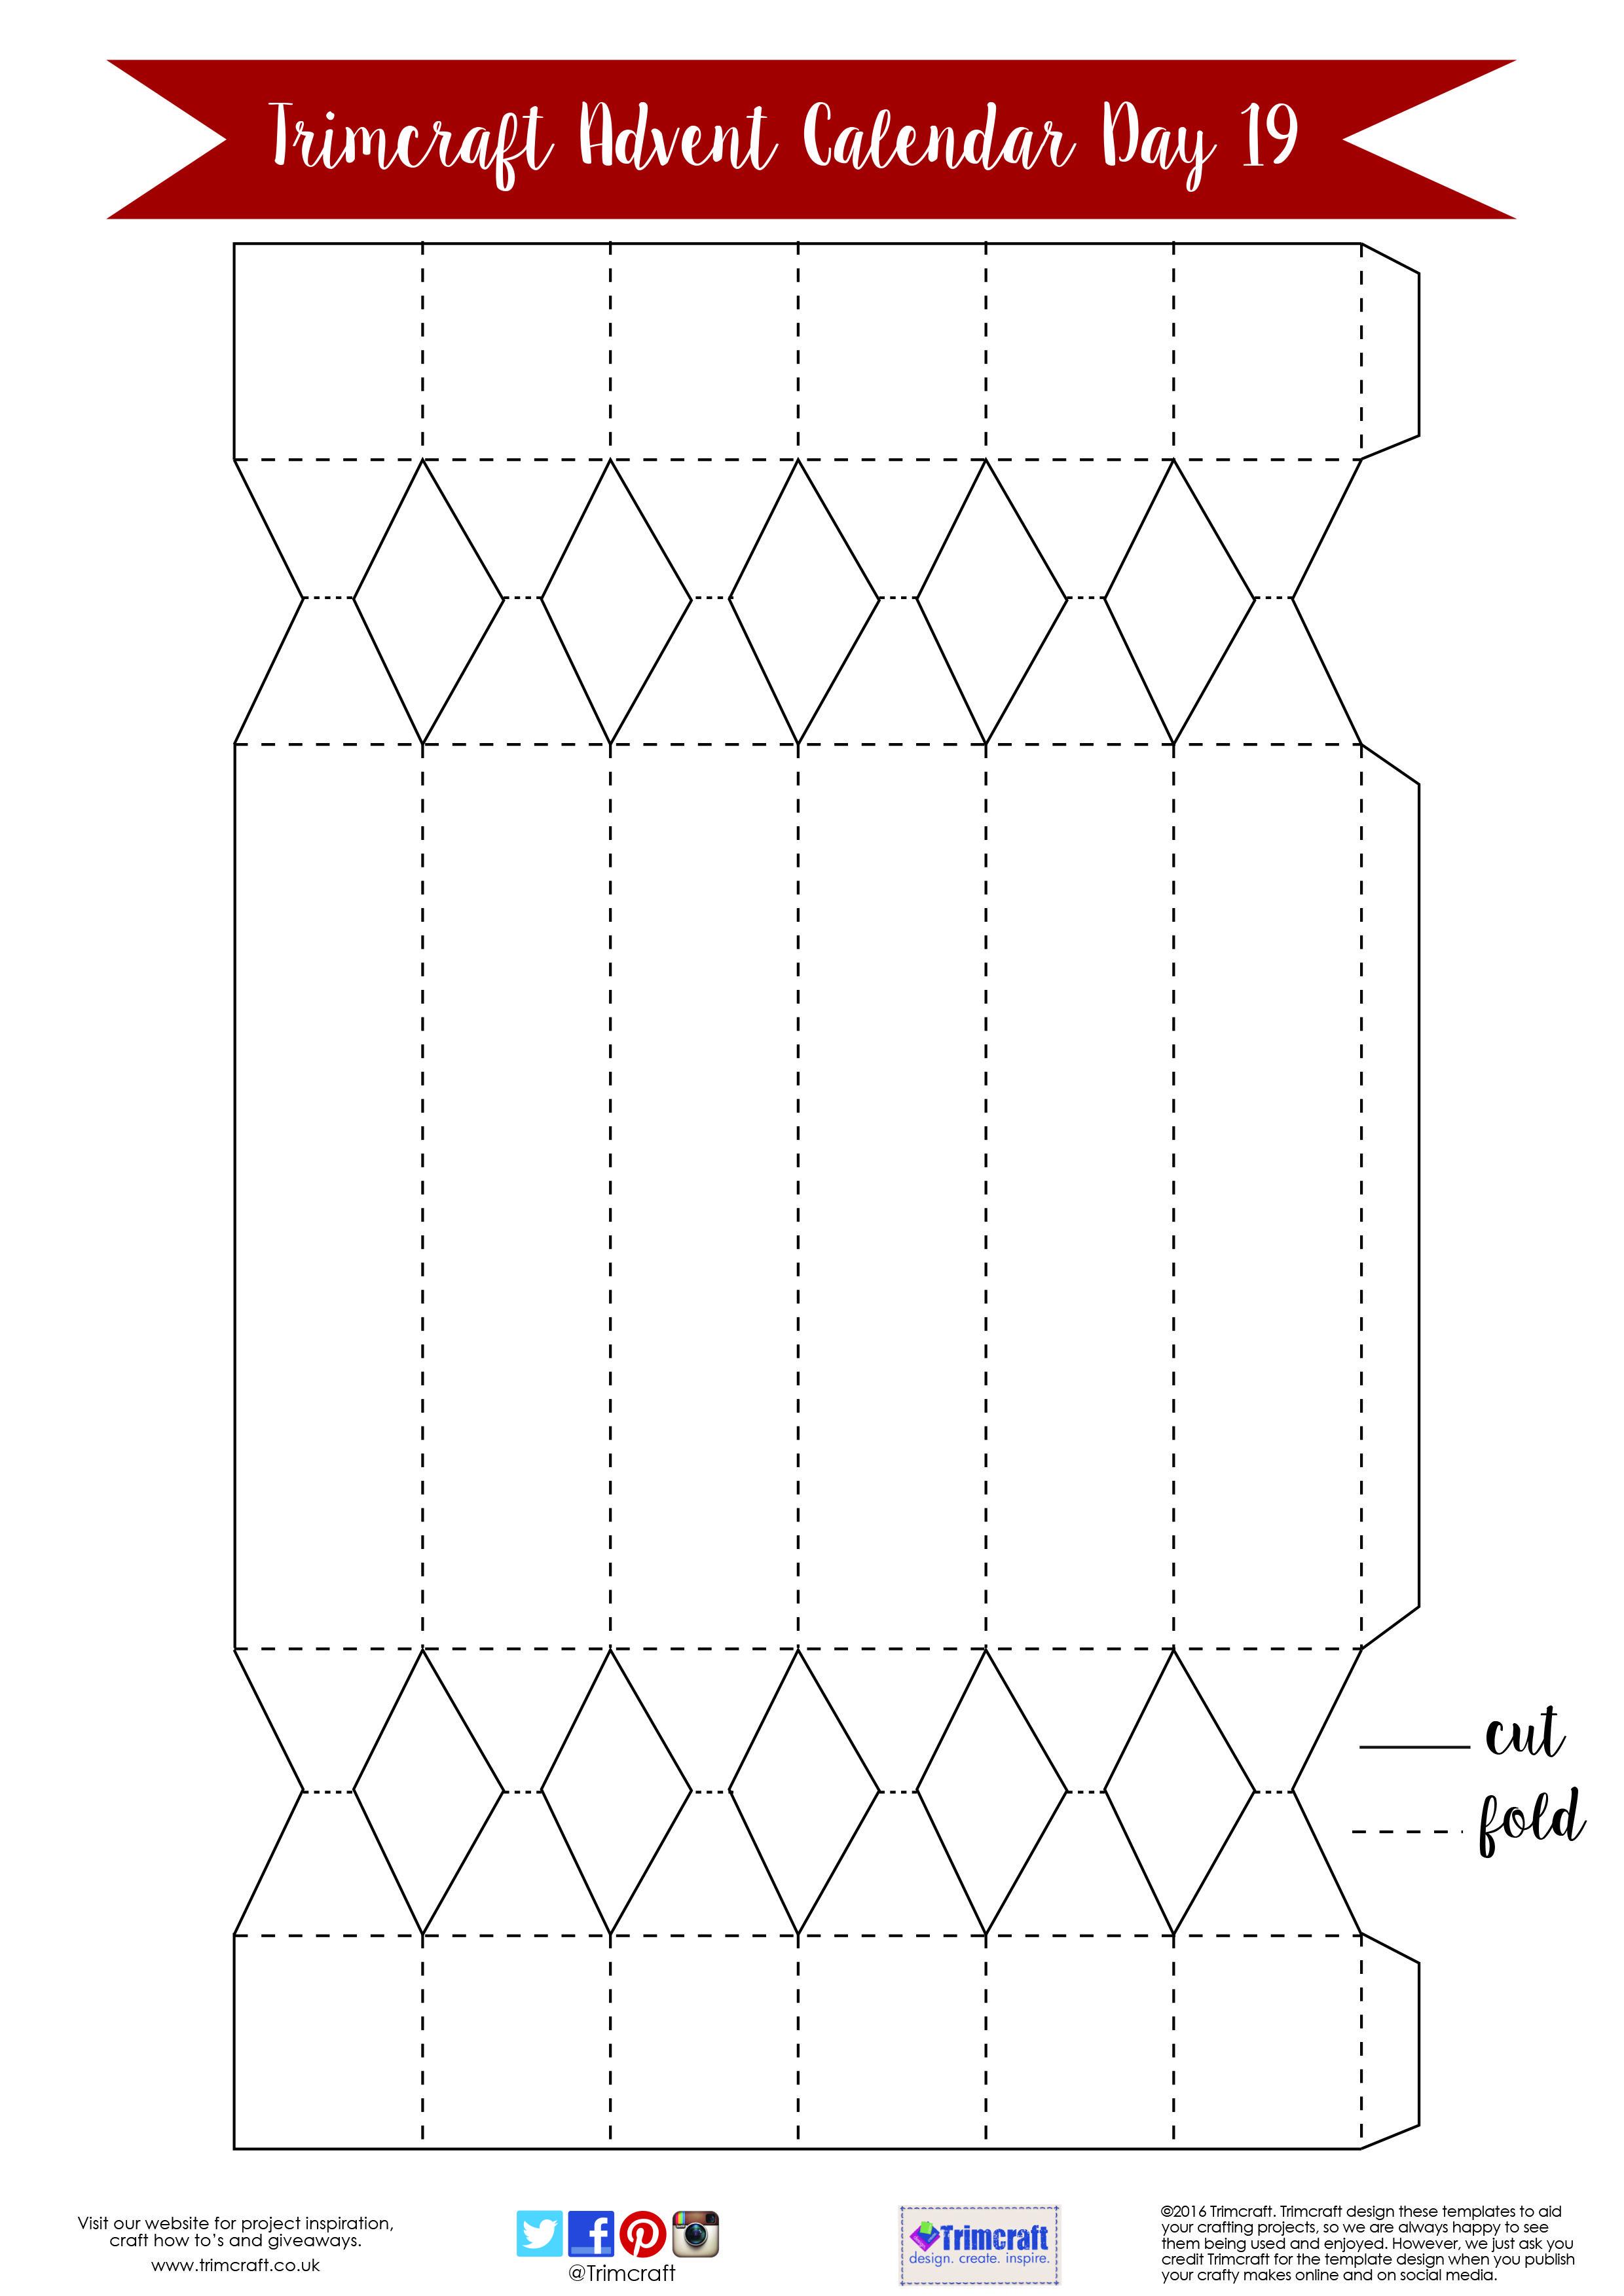 Christmas Cracker Template.Trimcraft Advent Calendar Day 19 Free Hexagonal Christmas